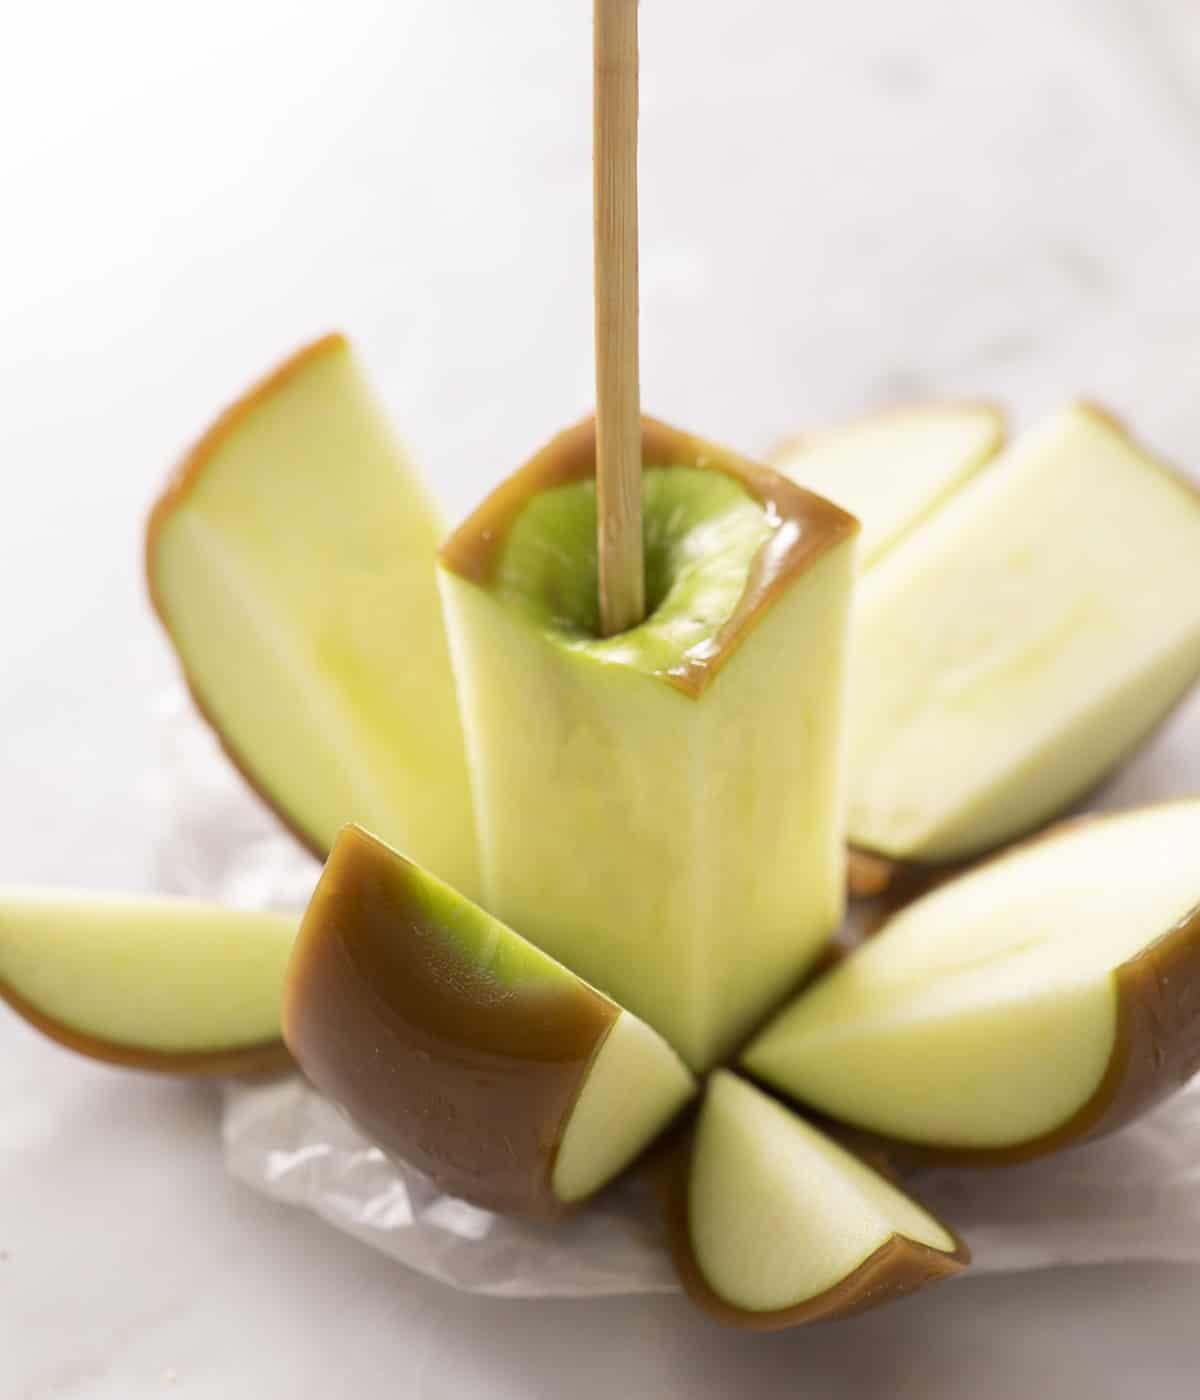 A caramel apple cut into pieces.